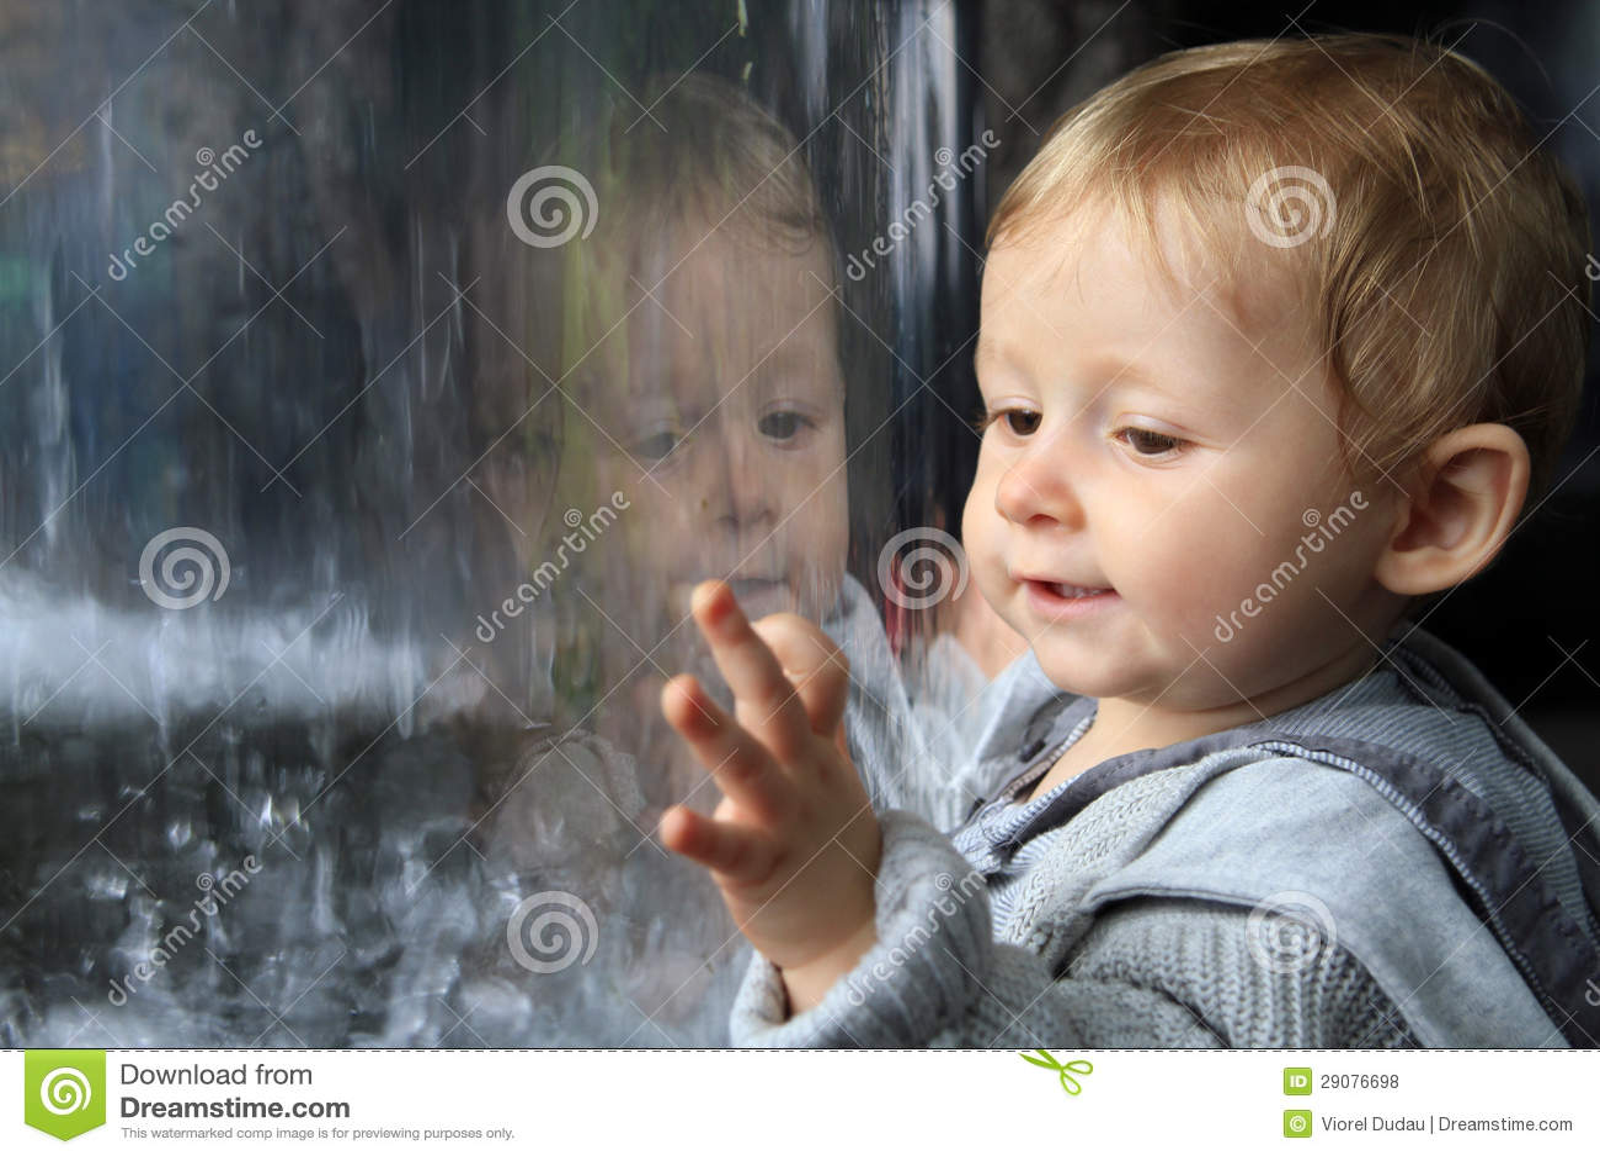 Baby portrait reflecting